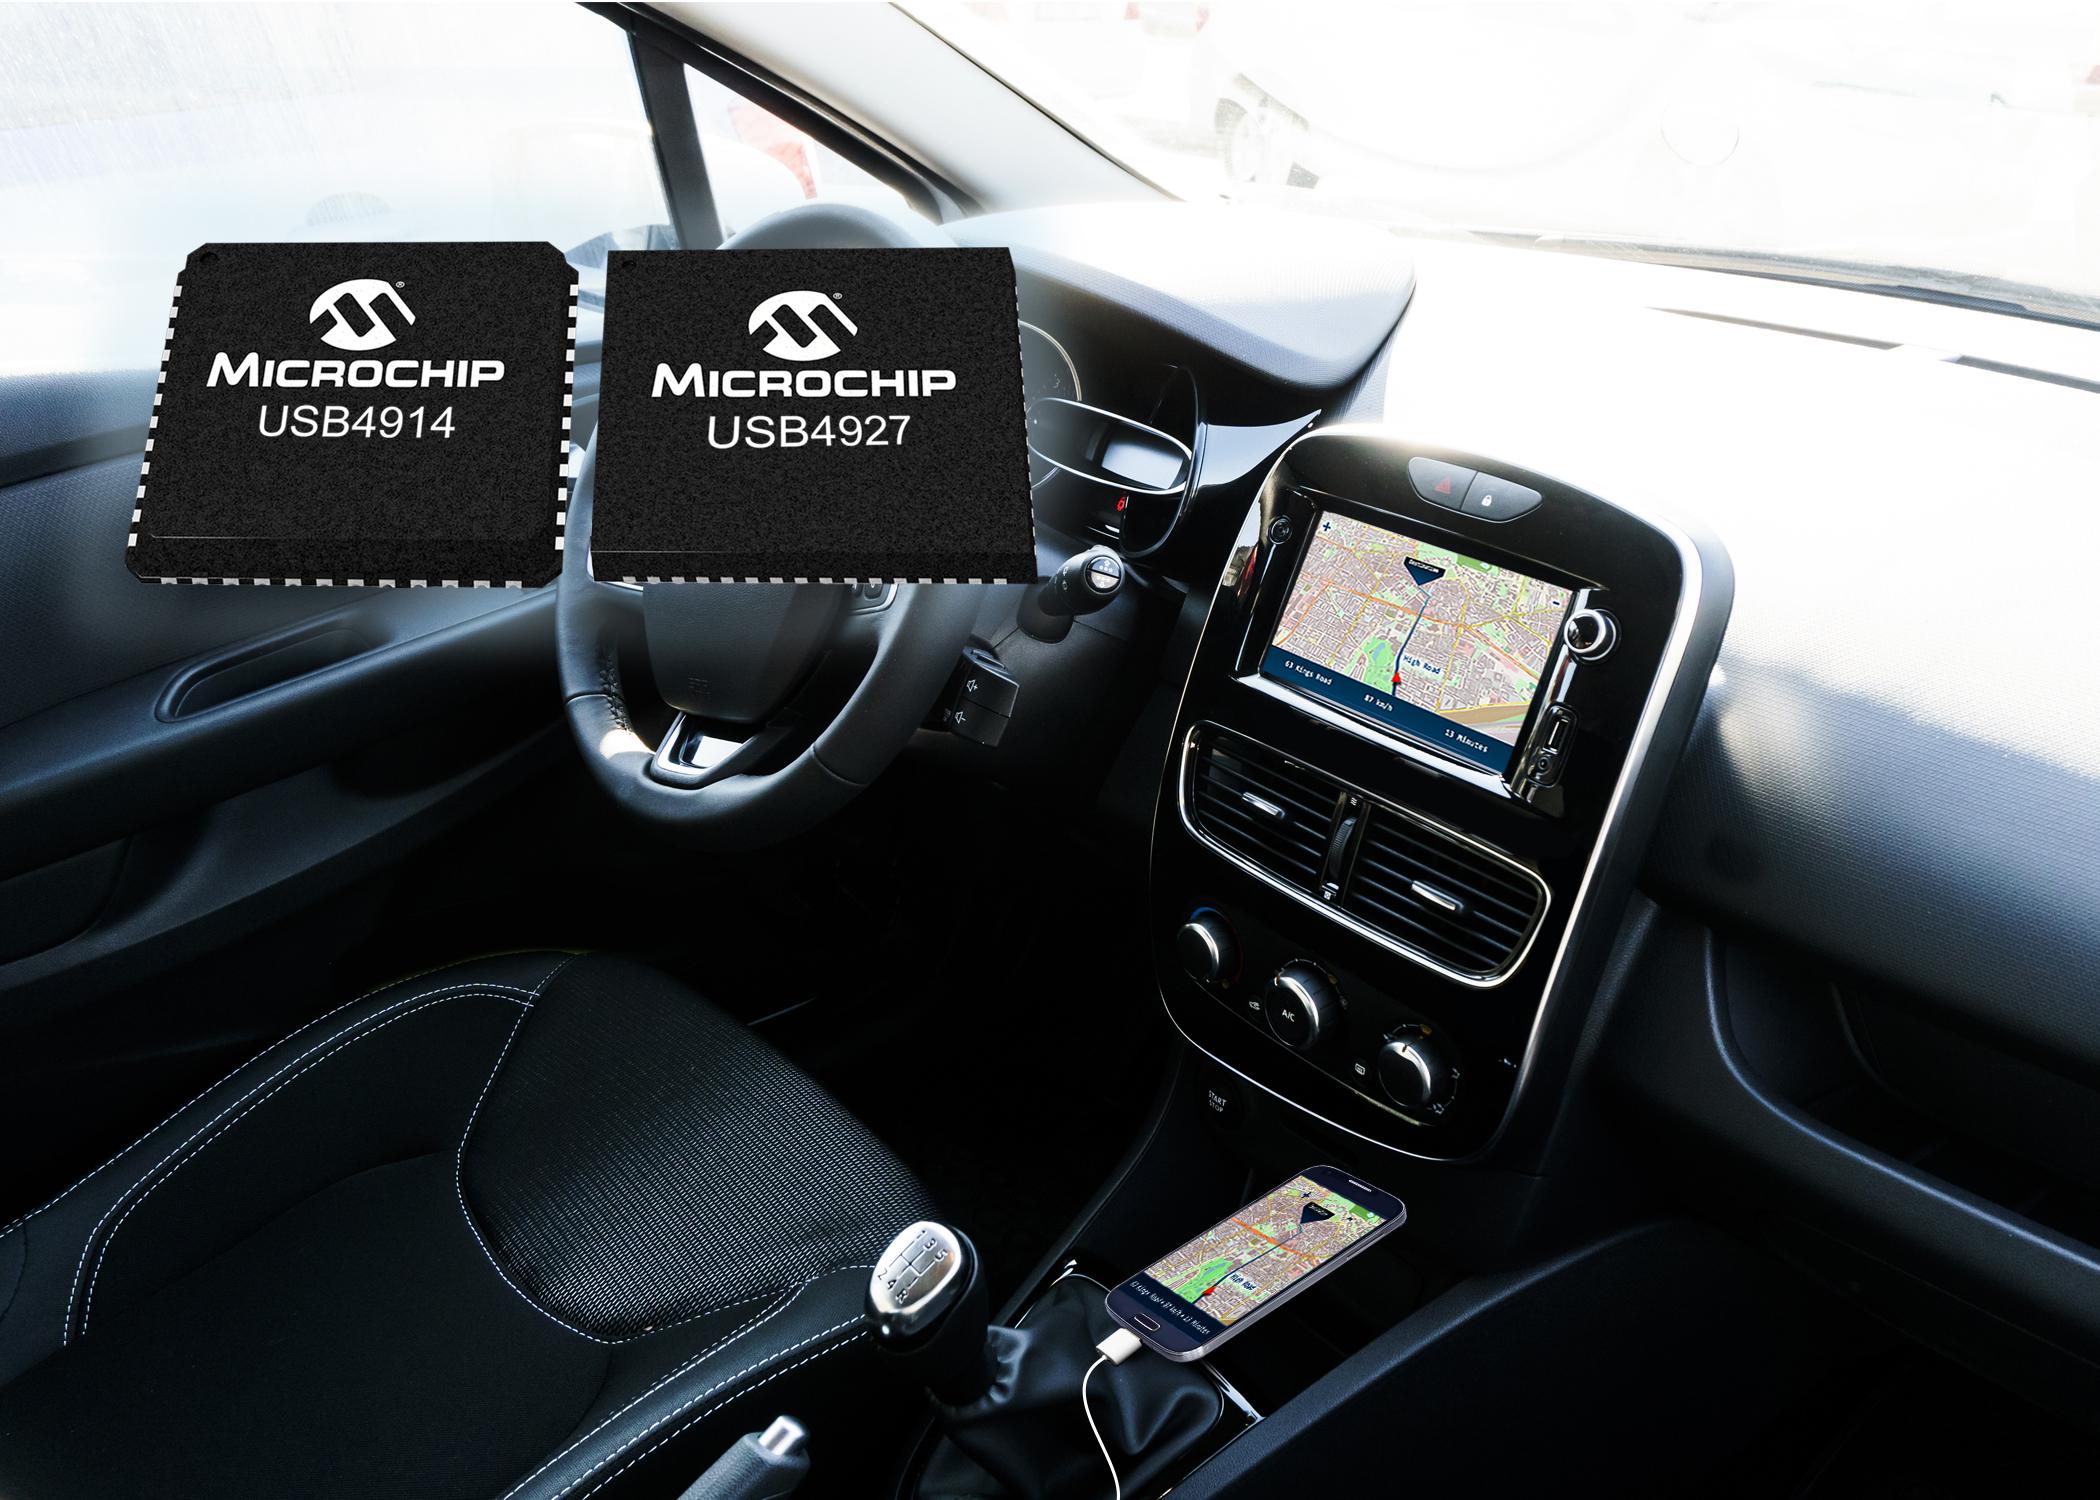 Microchip新款智能集线器IC支持集线器级联到第二和第三排座位,数据可同时出现在所有端口上,并具备充电功能。例如,如果有两个USB端口,一个端口可以把手机或者平板电脑连接到汽车主机,而另一个端口既可以充电也可以上传/下载数据。采用Microchip的新款USB4914、USB4916、USB4925和USB4927智能集线器IC,汽车制造商可以定制自己的解决方案以满足其设计需求。随着汽车越来越成为一种娱乐环境,制造商可以开发新颖的解决方案——支持消费者使用一部手机进行导航,而